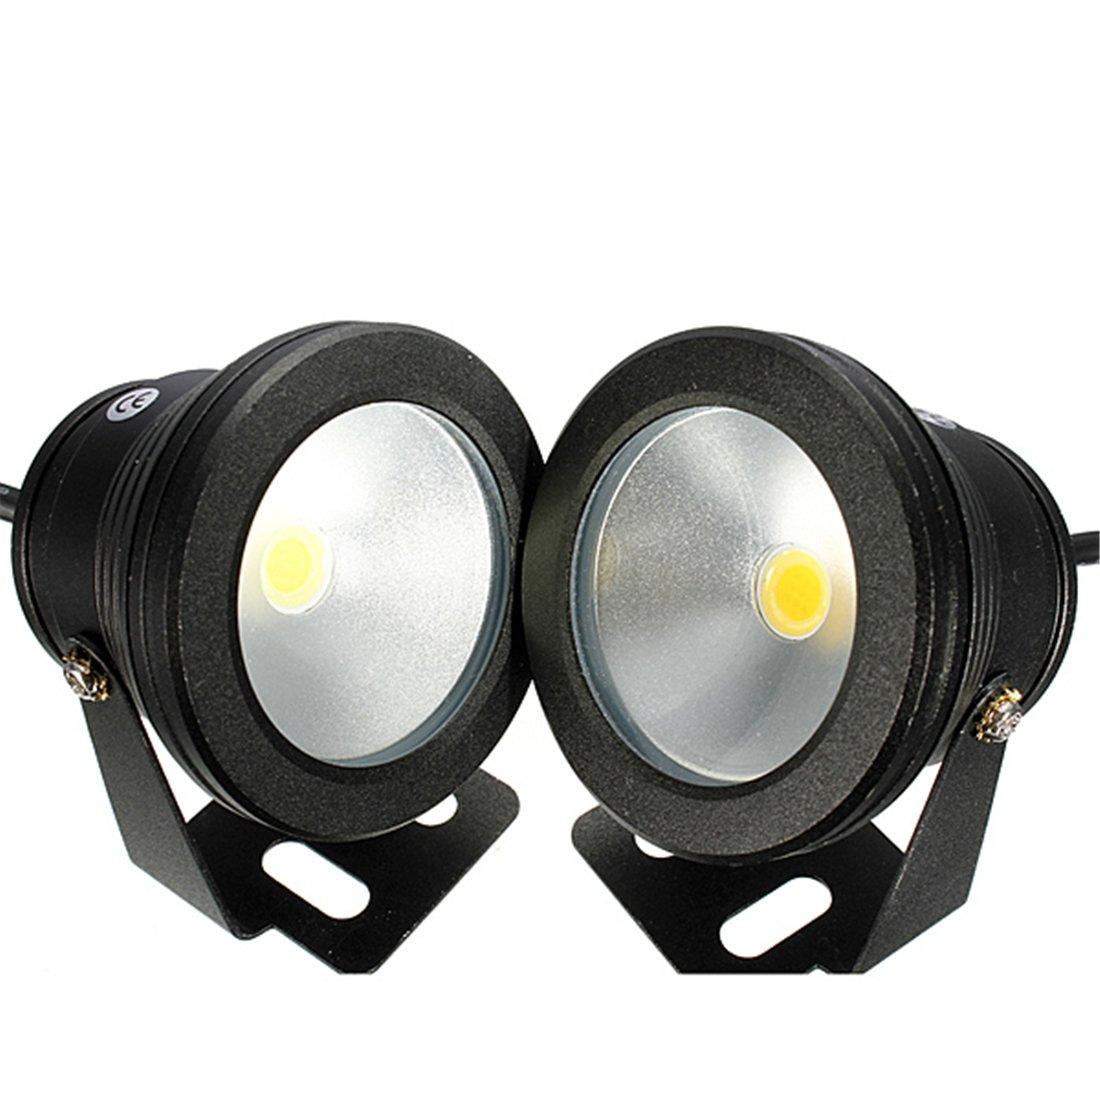 Warm White, silver body : 1pc 10W 12V Waterproof LED Flood Light Underwater Fountain Light Wash Pond Fish Tank Aquarium Light Spot Lamp Outdoor Lighting